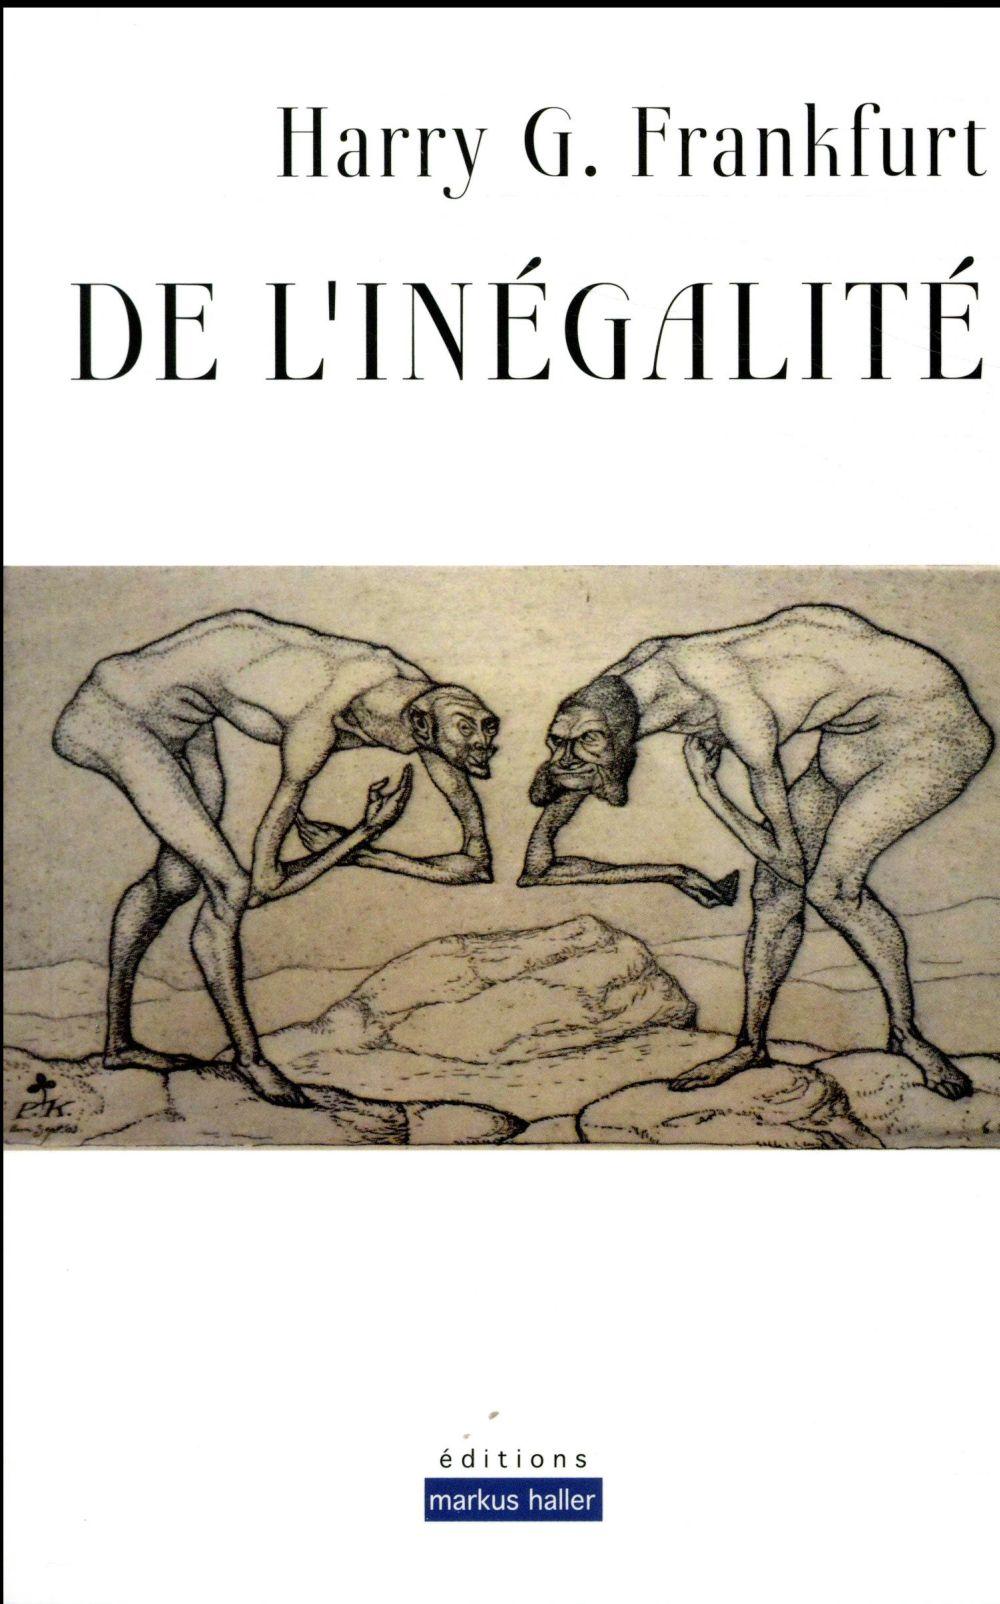 DE L'INEGALITE